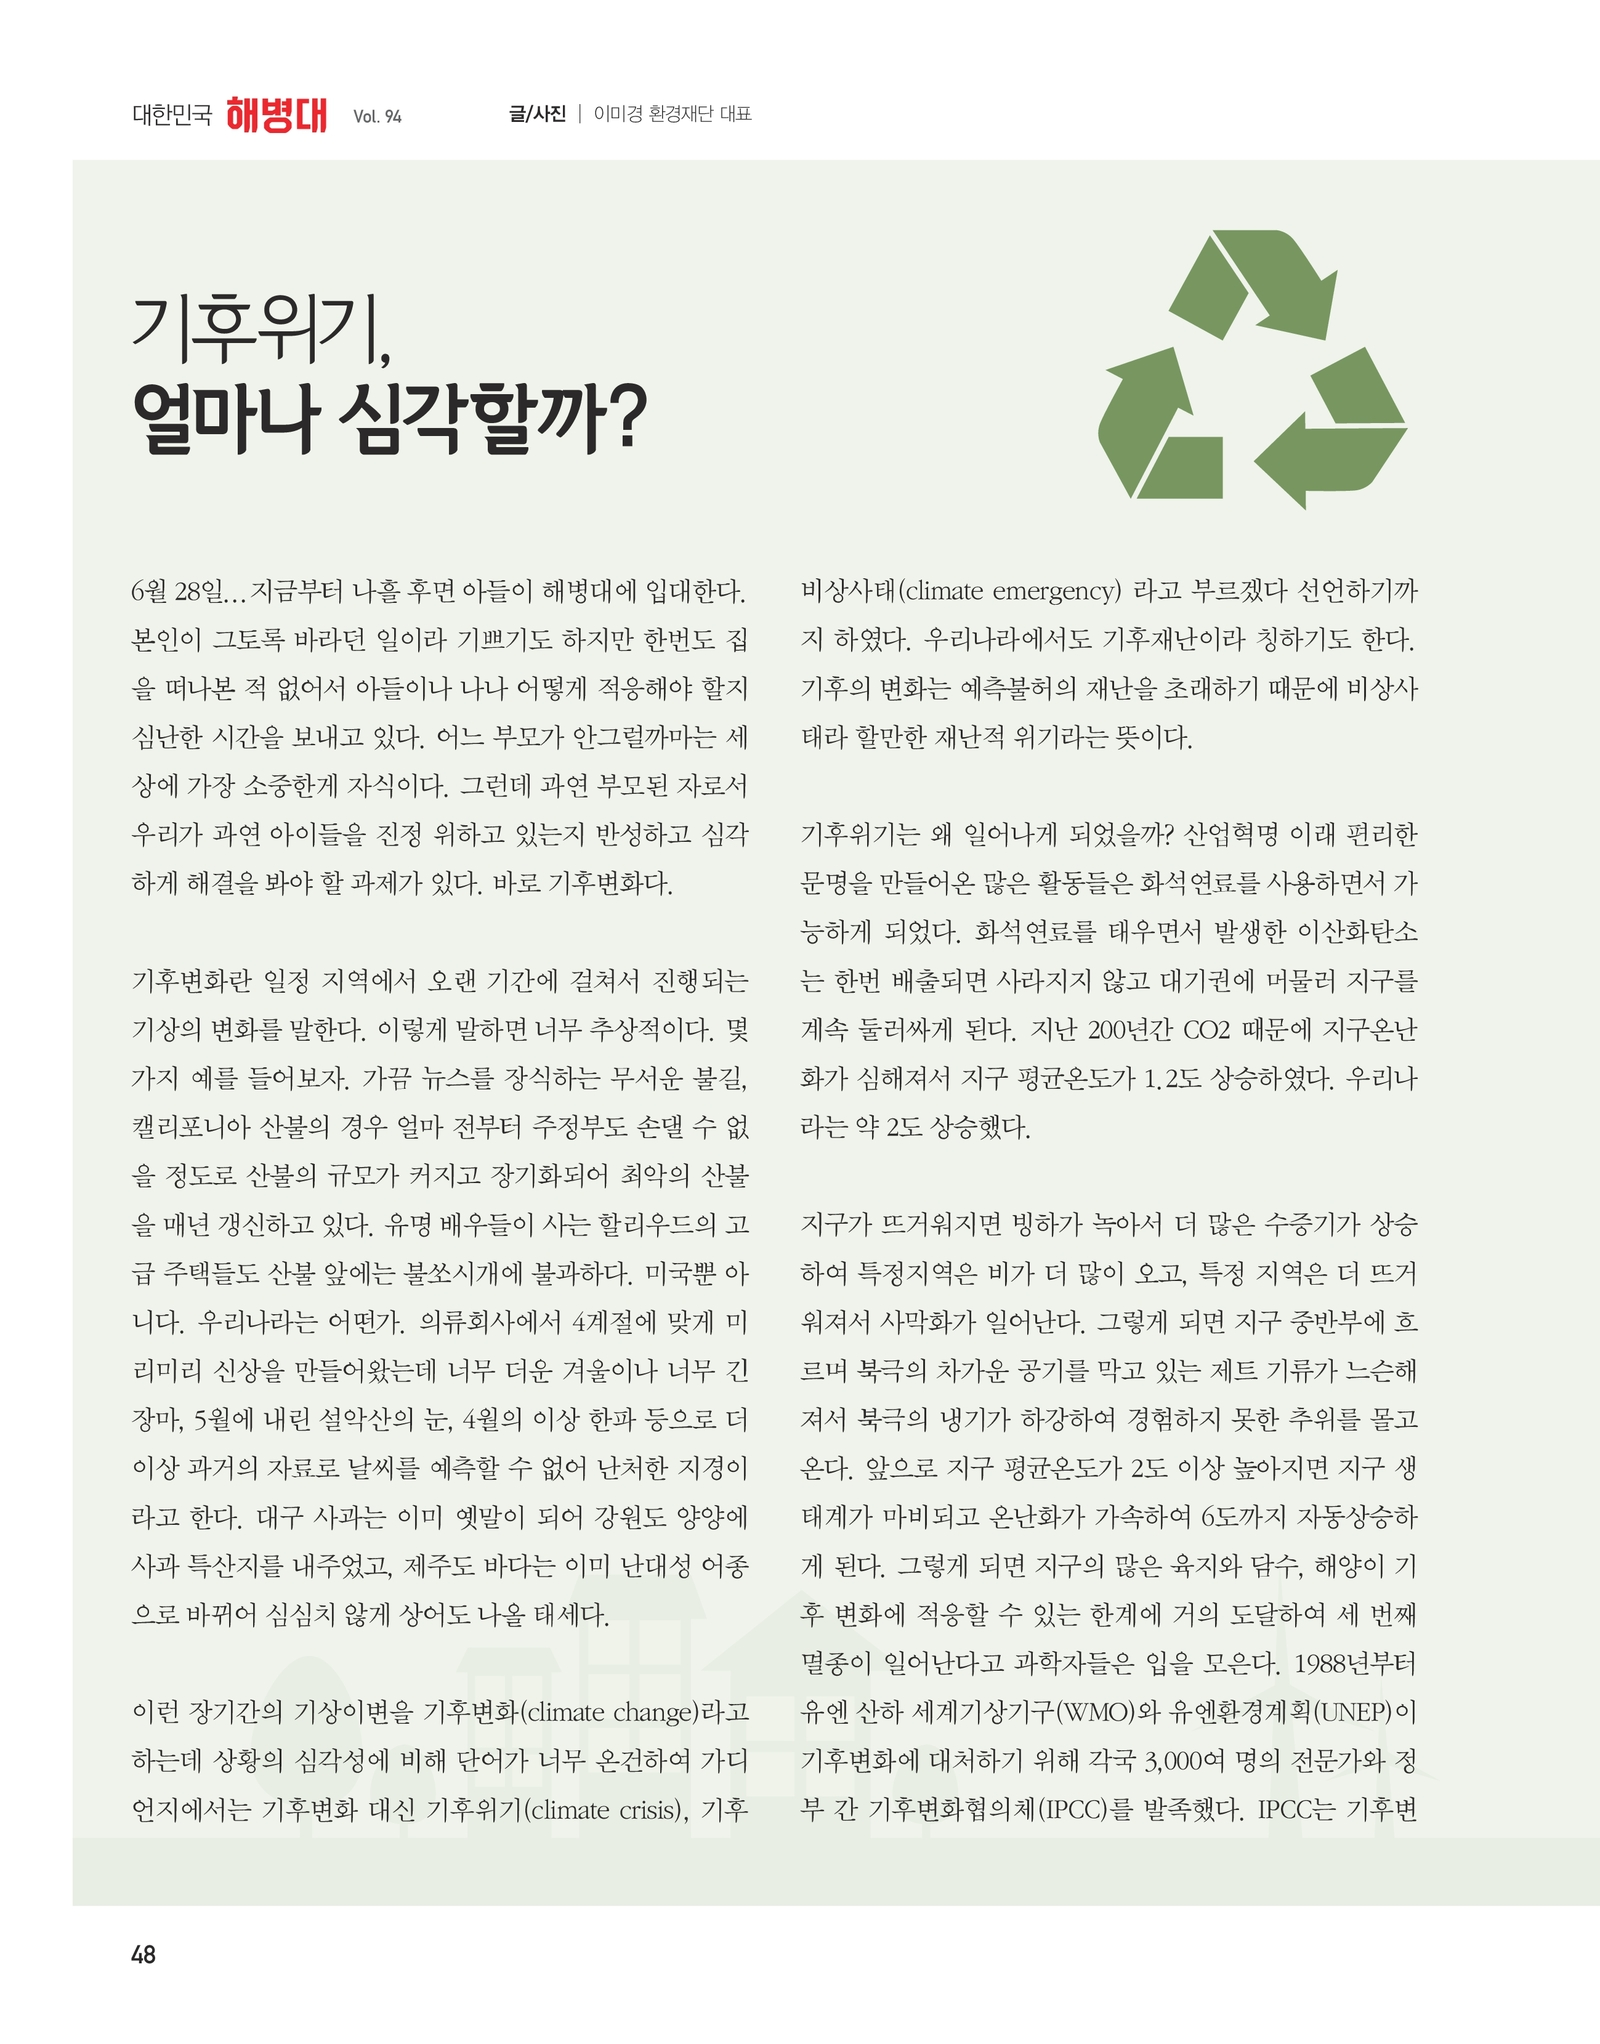 page-134083-0050.jpg